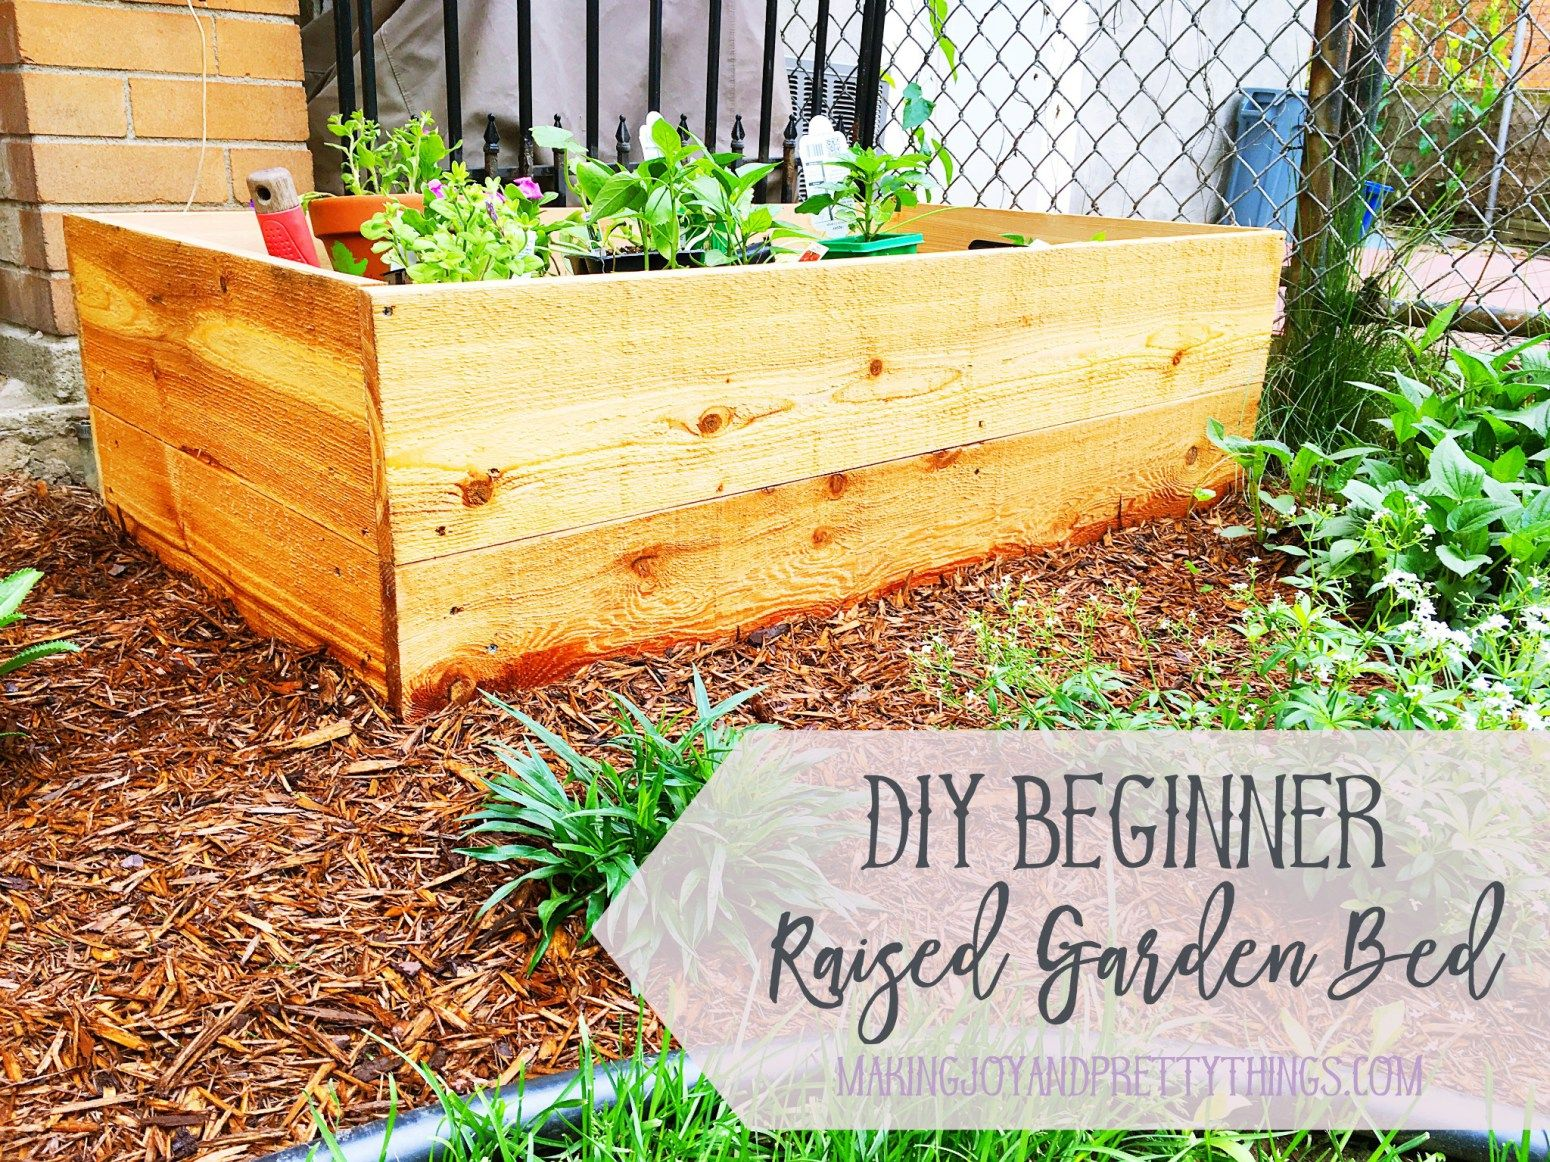 DIY Beginner Raised Garden Bed Raised garden beds